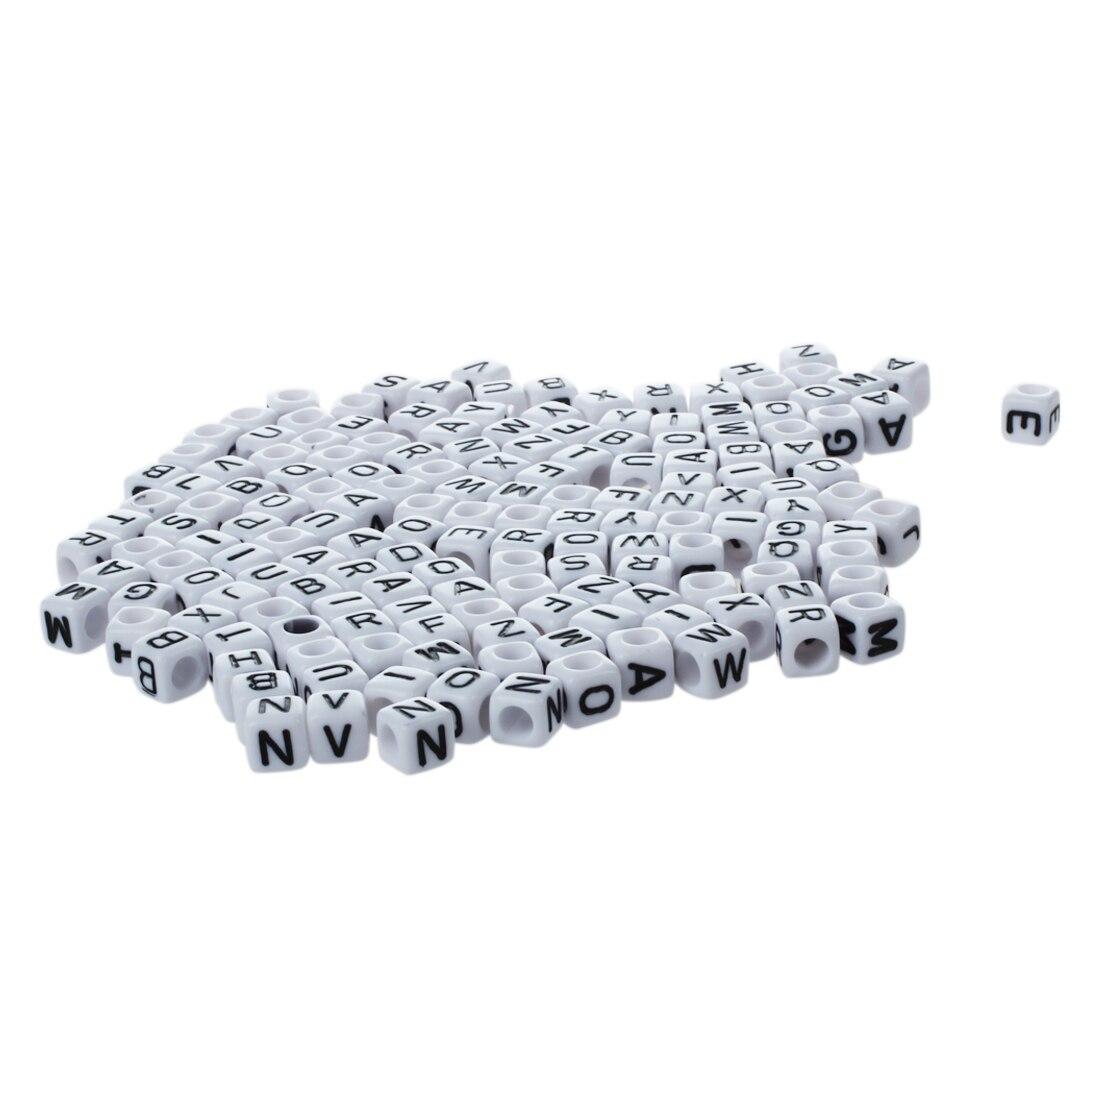 290pcs/50g Acrylic Beads ALPHABET black and white CUBE A-Z mixture 6*6mm